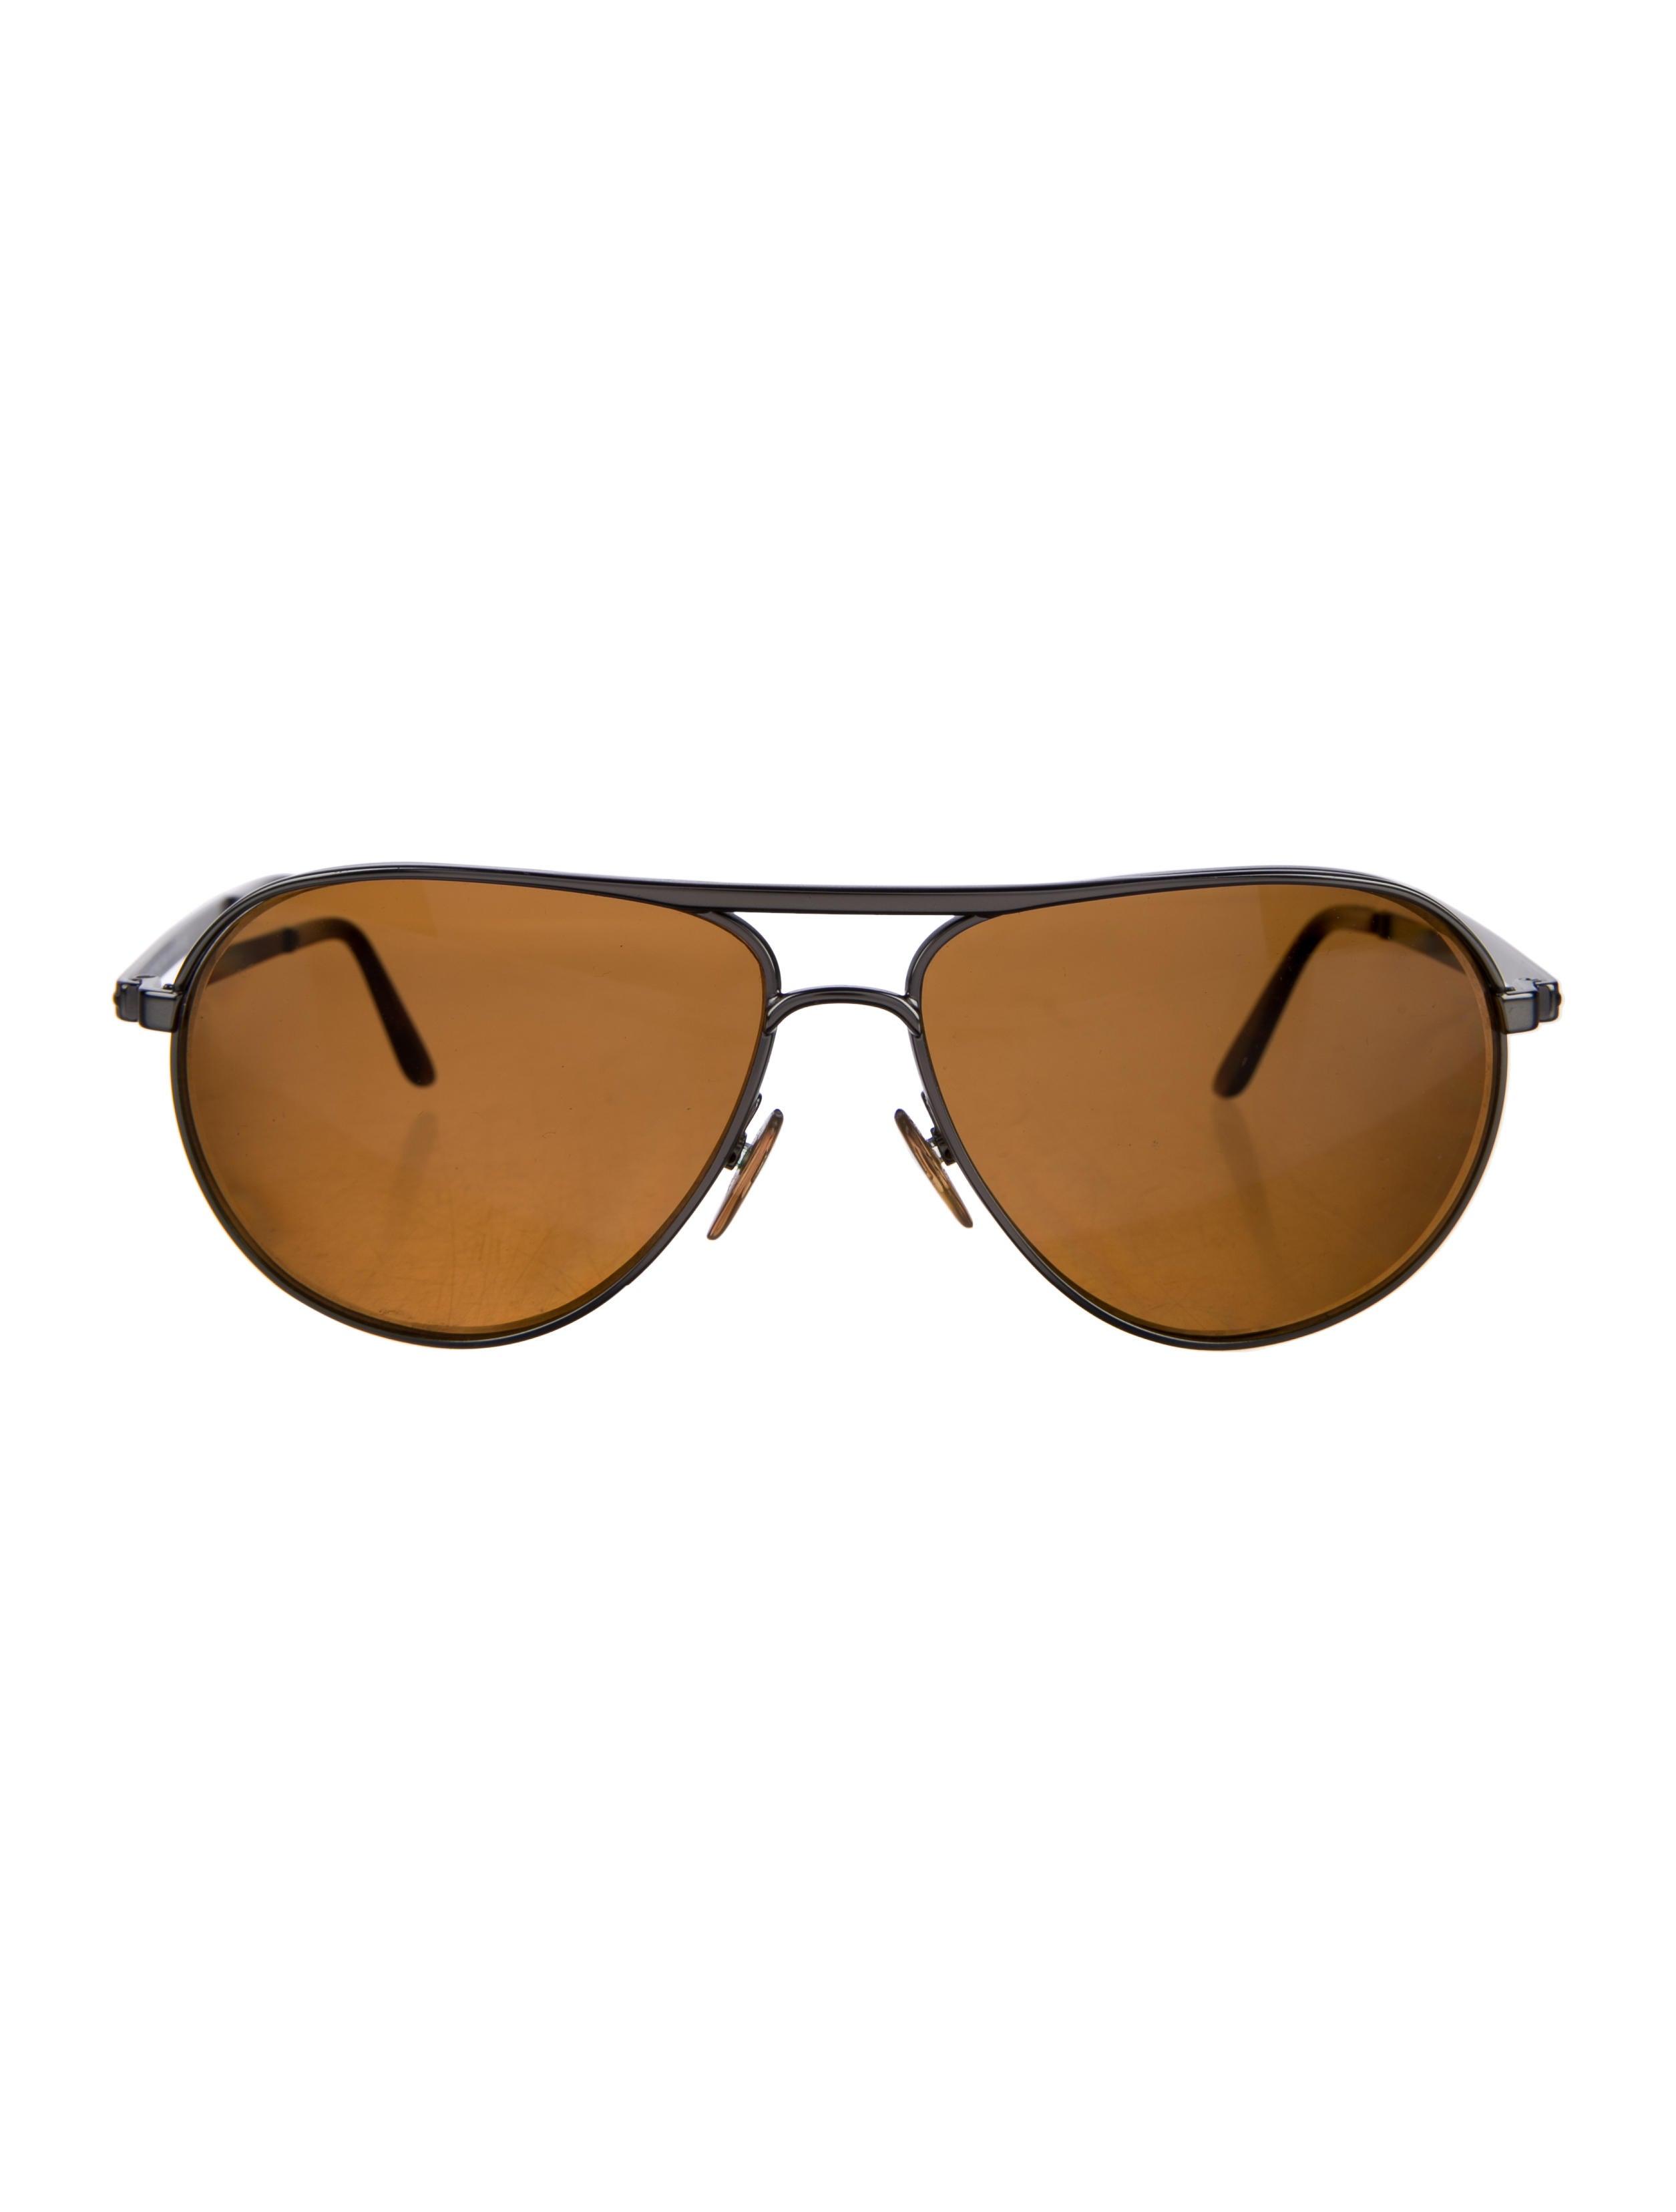 619e37b4f5fc1 Tom Ford Marko Aviator Sunglasses - Accessories - TOM38871